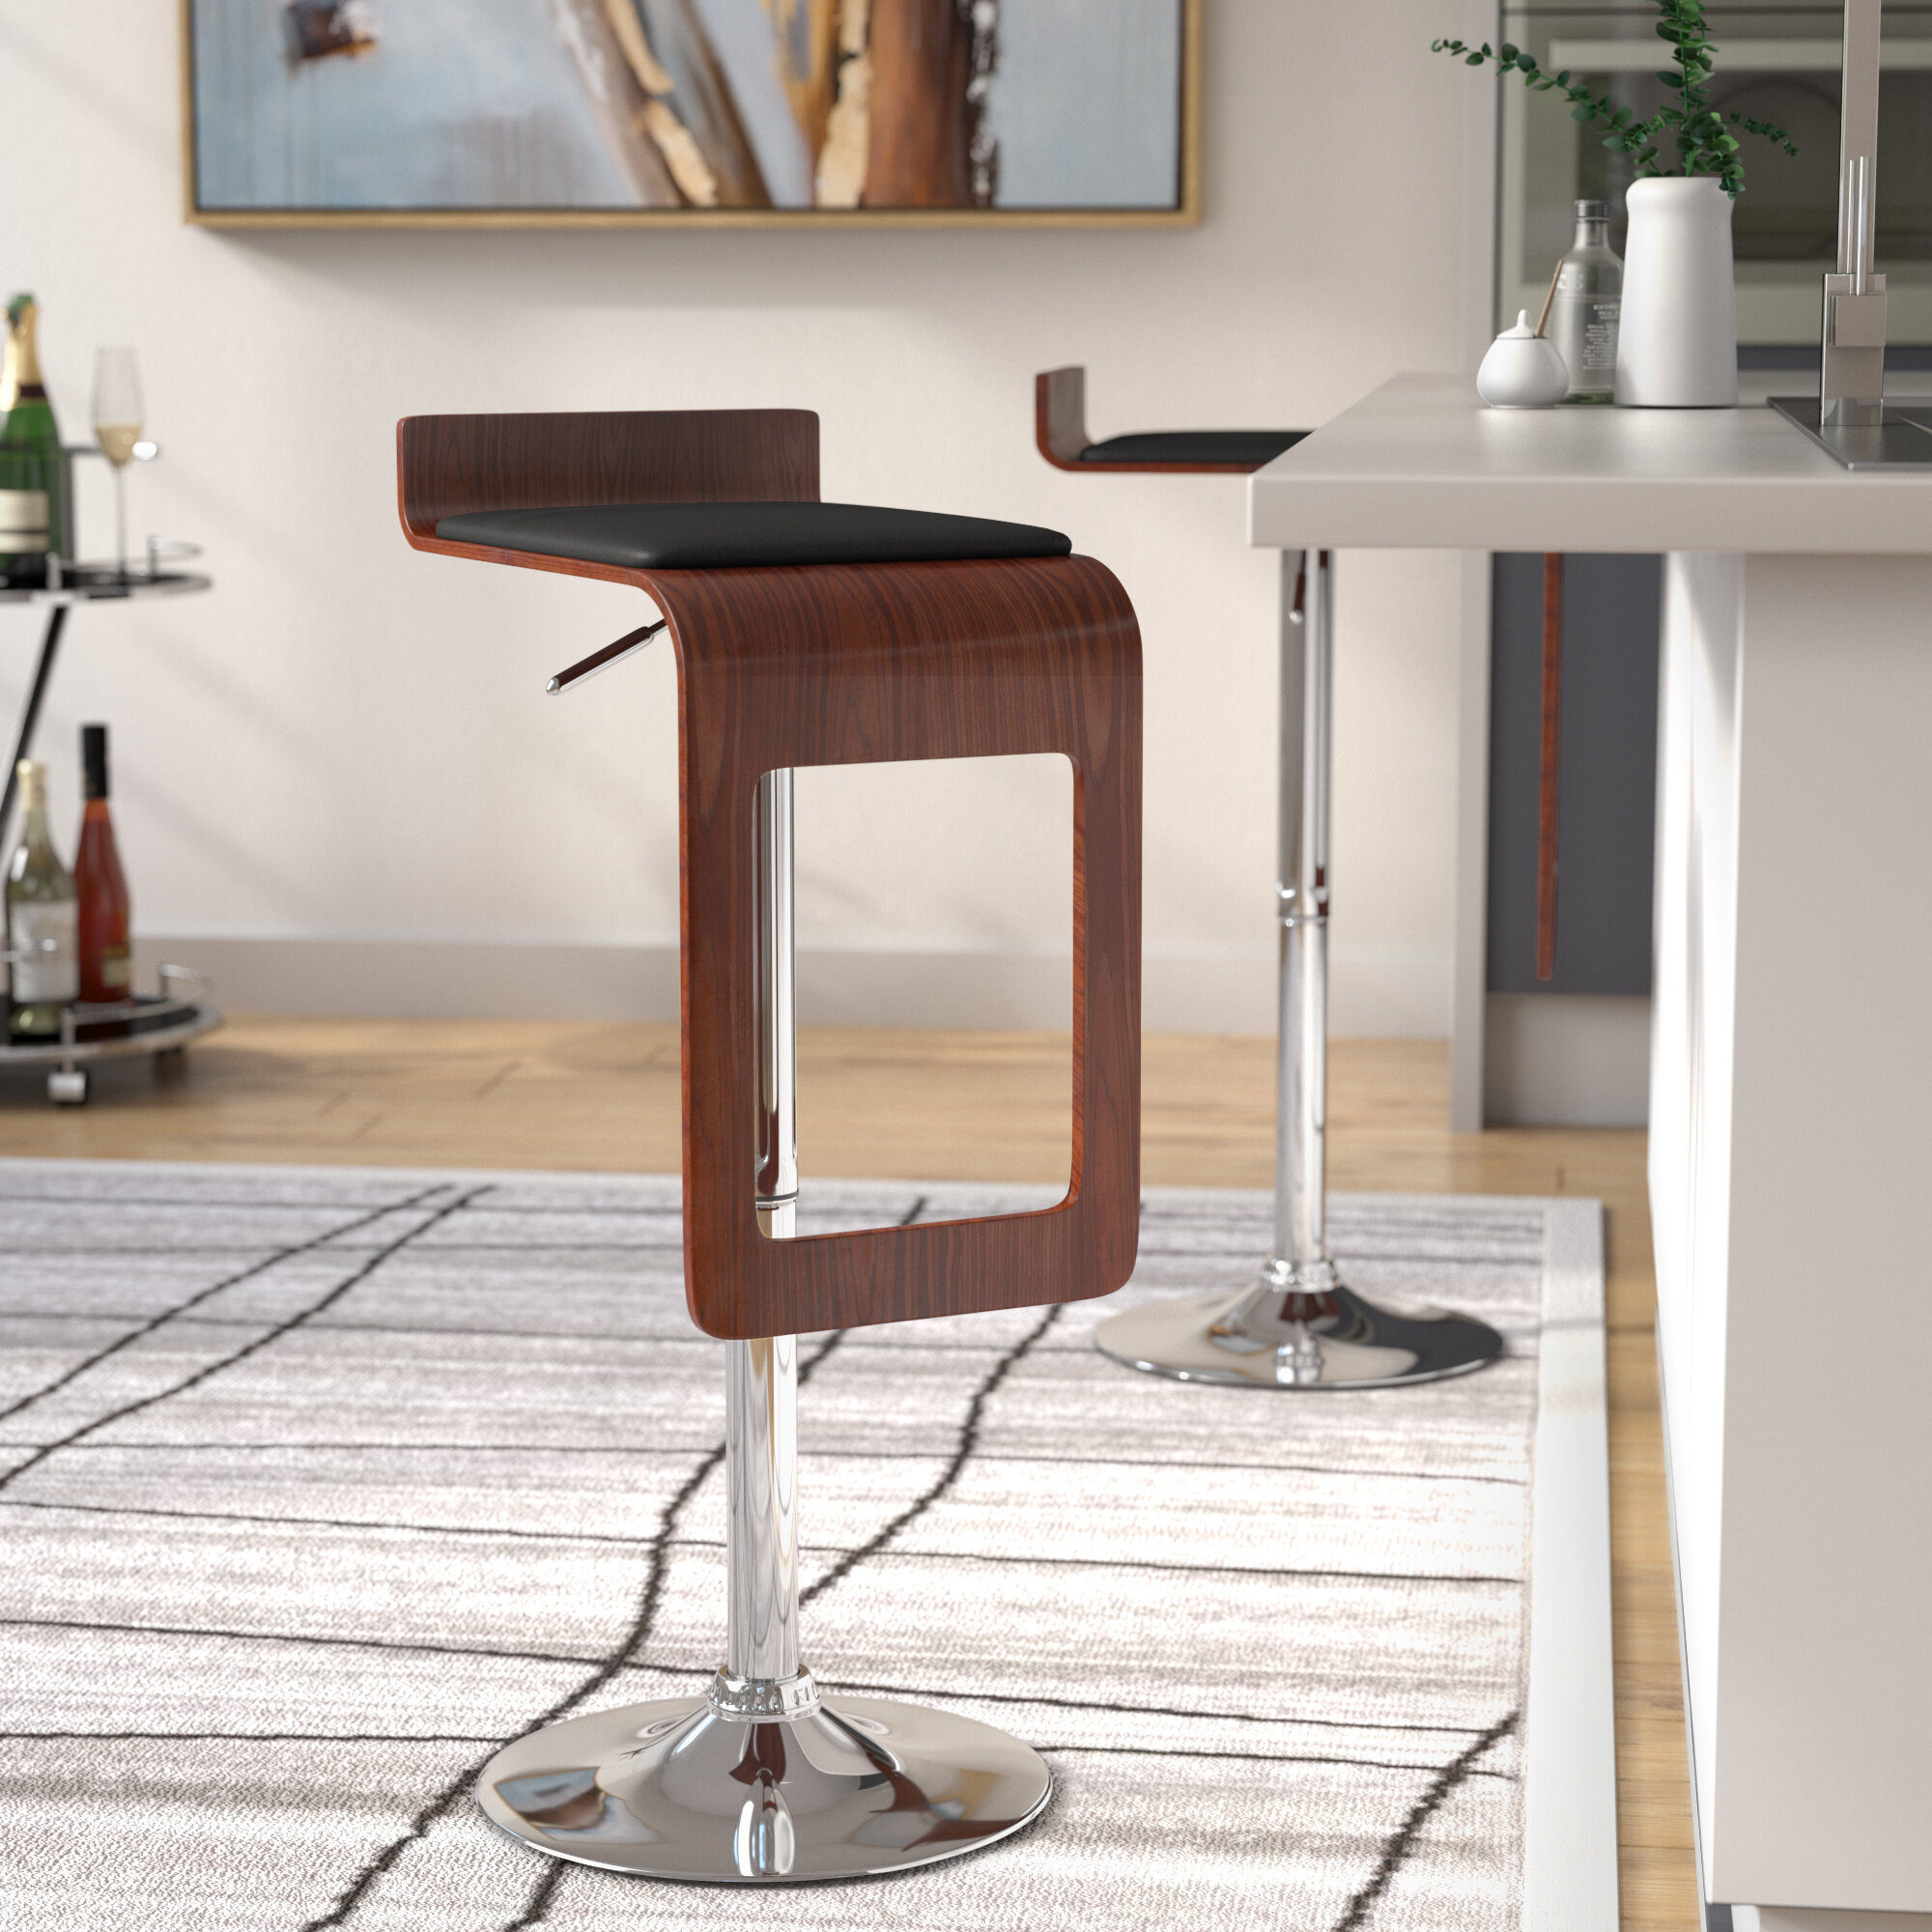 Peachy Catina Adjustable Height Swivel Bar Stool Theyellowbook Wood Chair Design Ideas Theyellowbookinfo